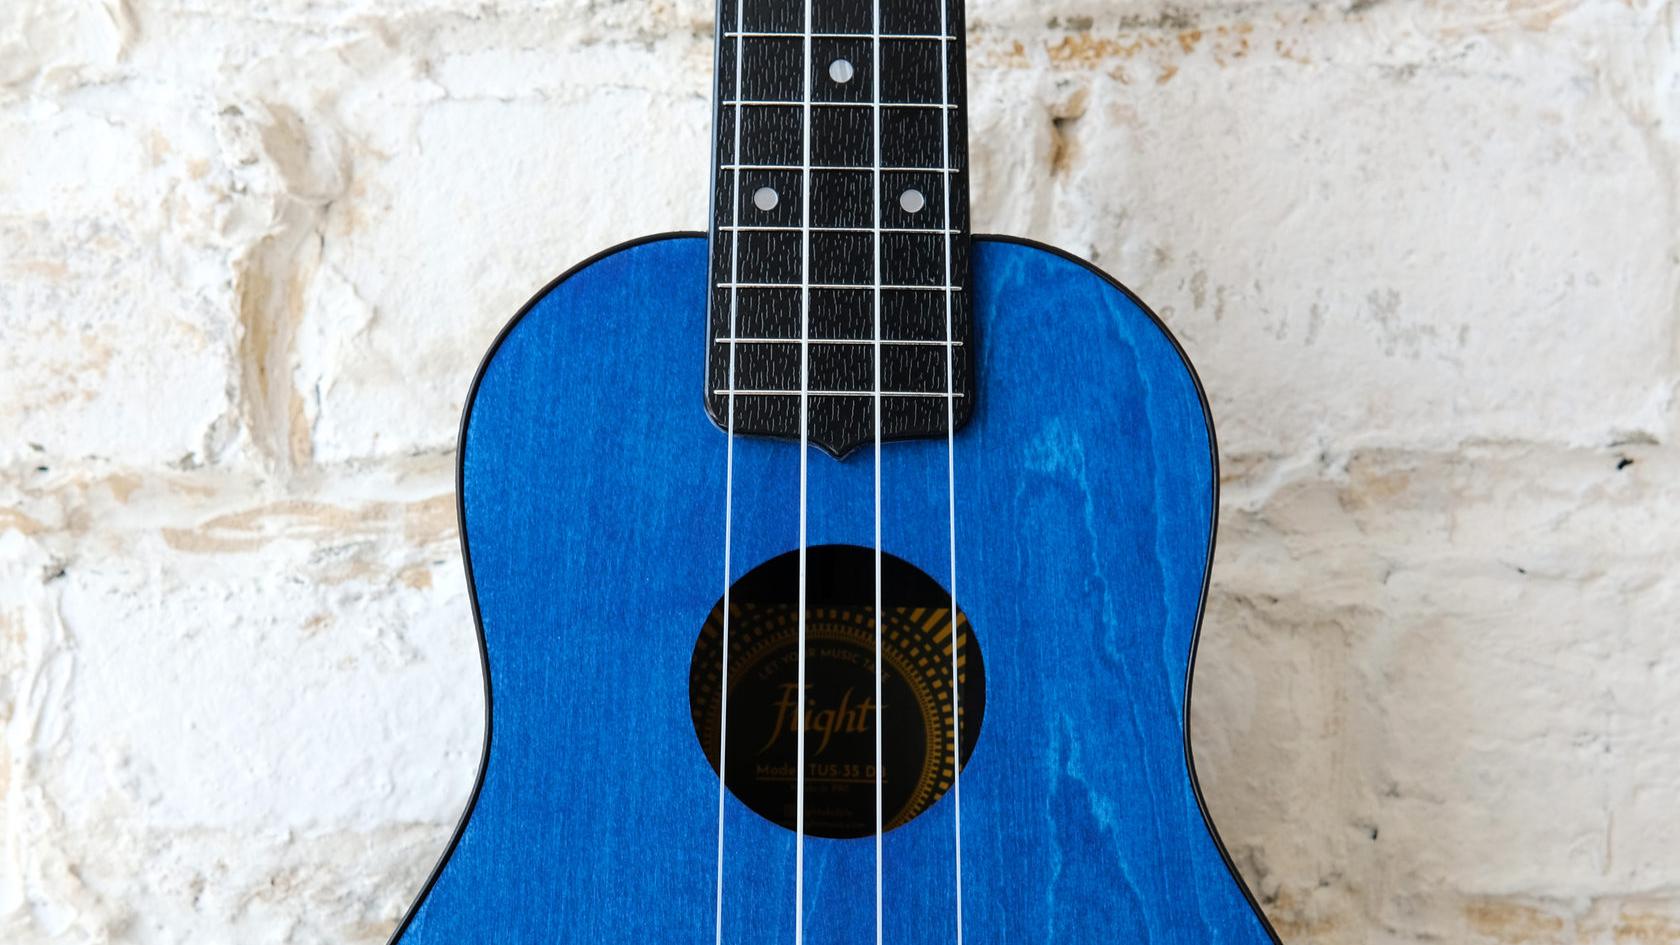 Купить укулеле сопрано Flight TUS в магазине ukelovers, ukulele Flight, travel ukulele